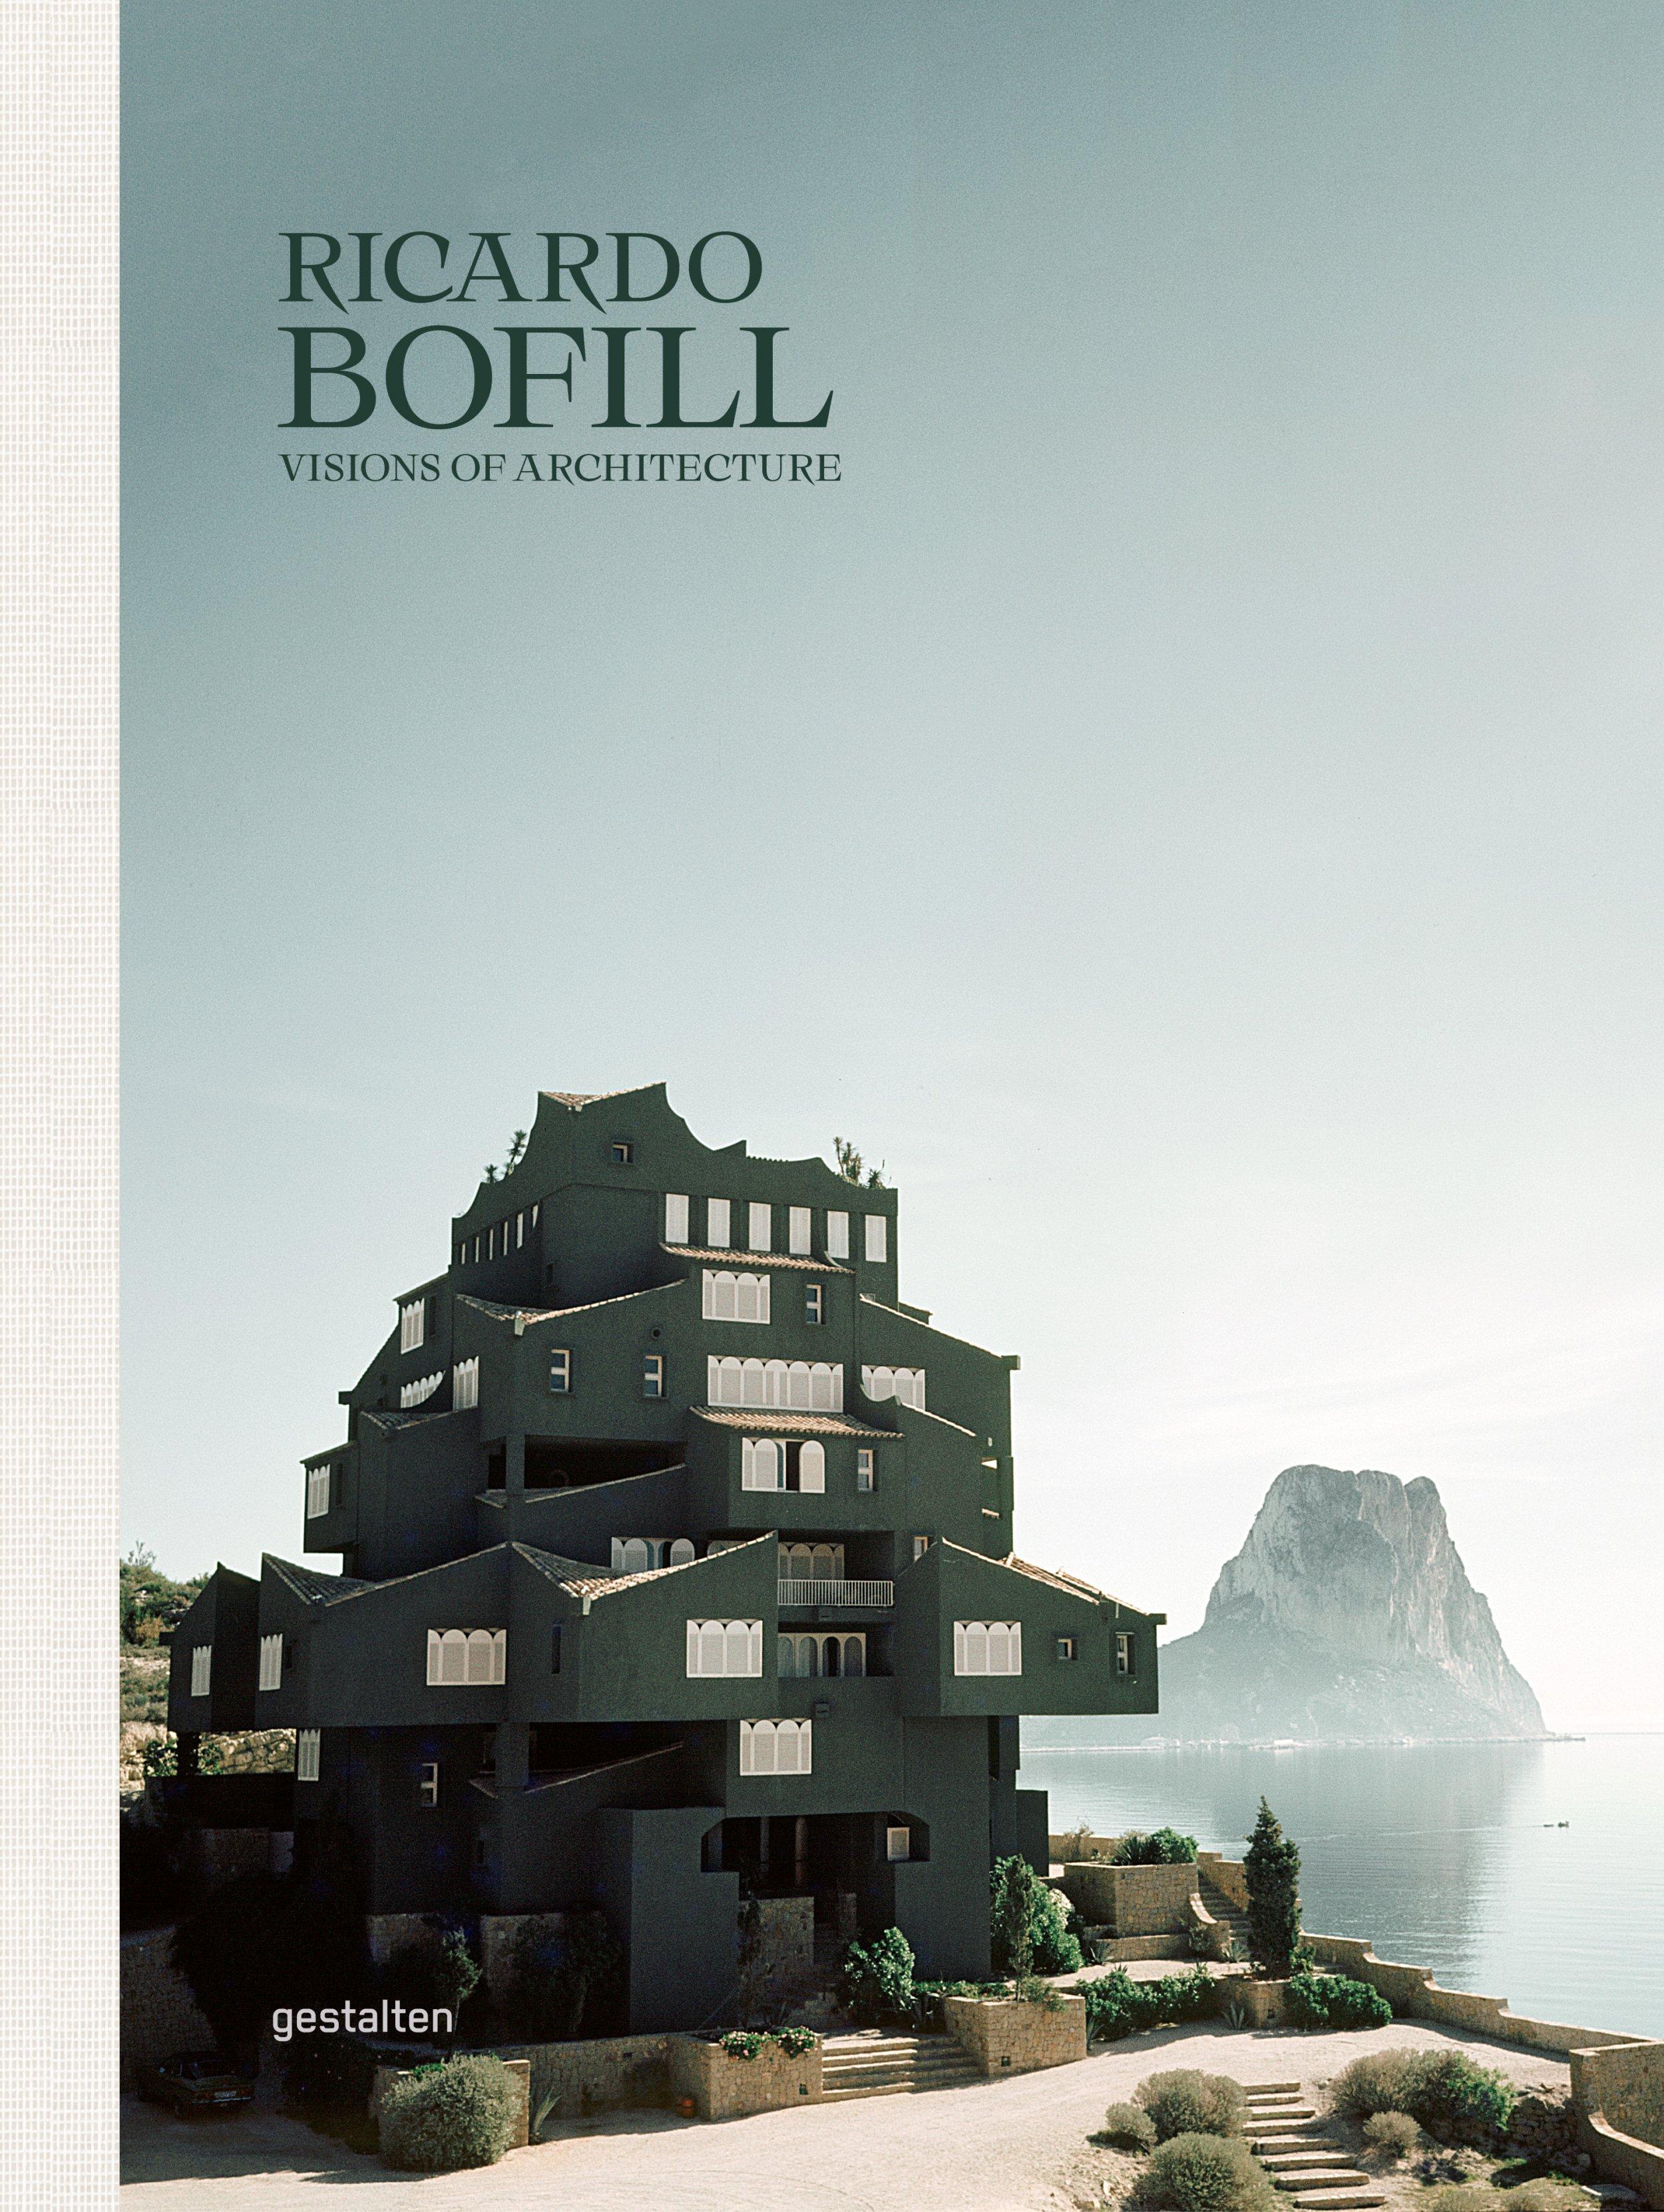 RicardoBofill_gestalten_Cover